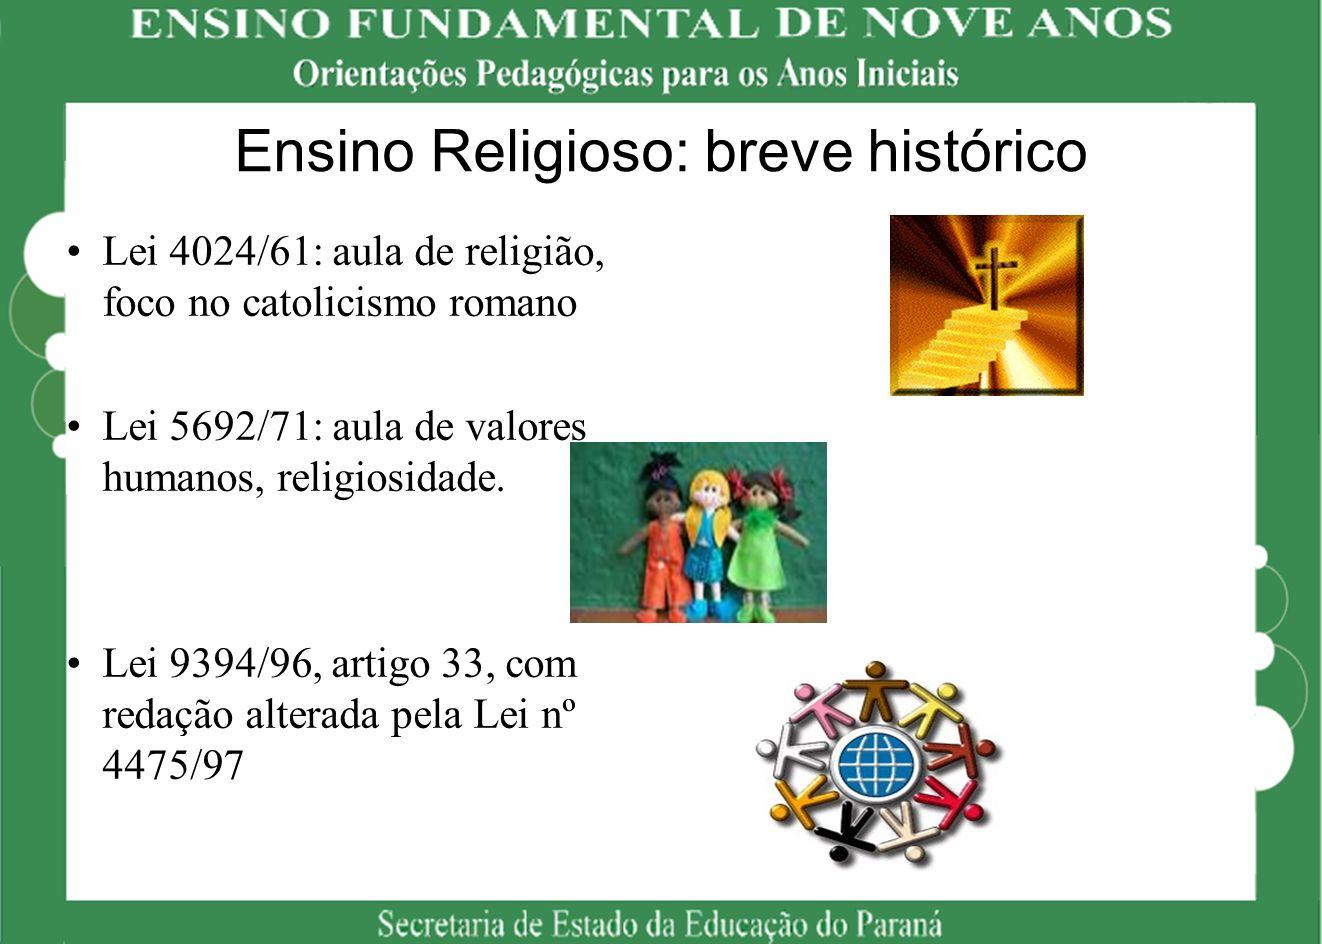 Ensino Religioso: breve histórico